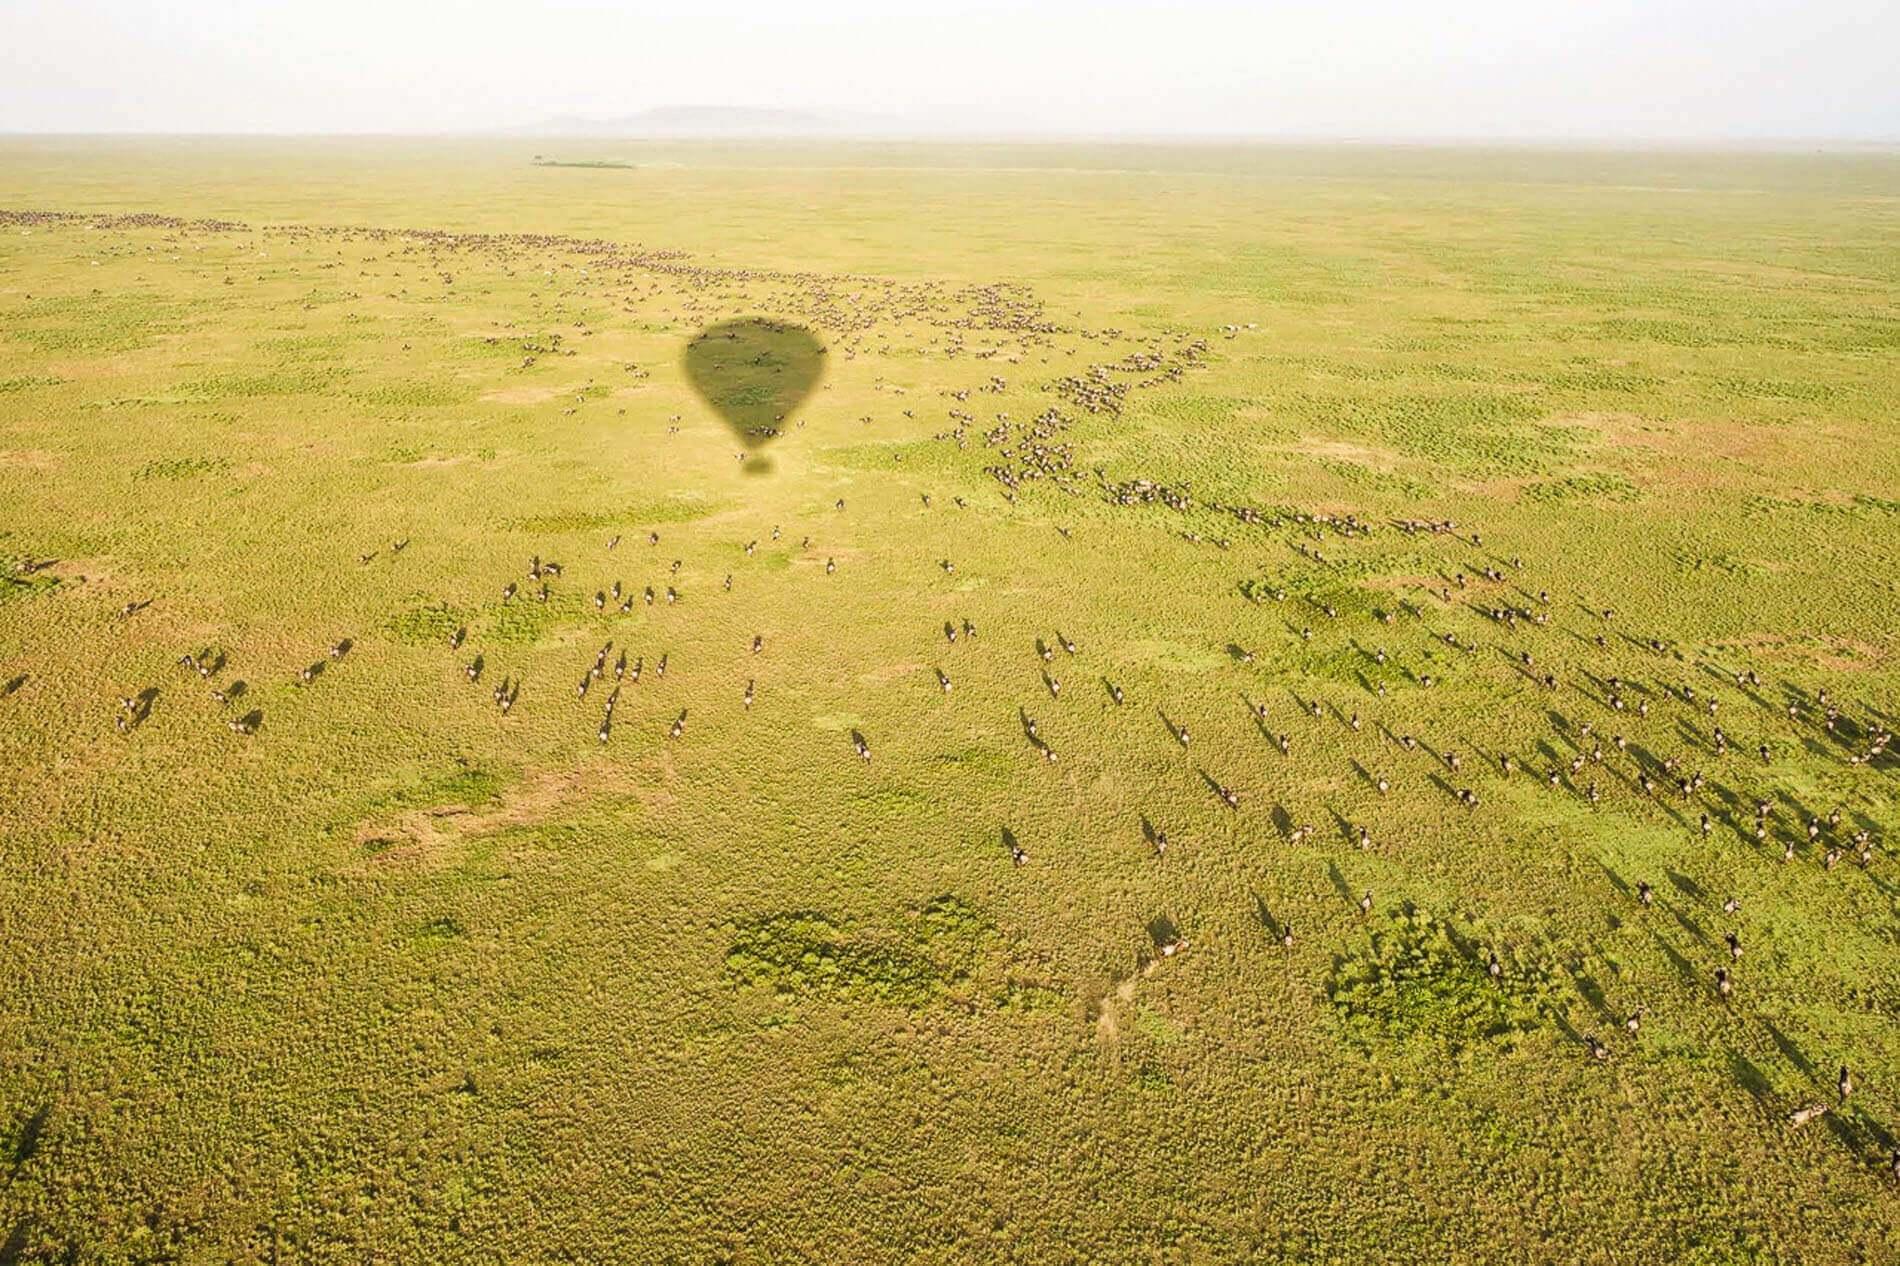 The Great Migration of Wildebeest